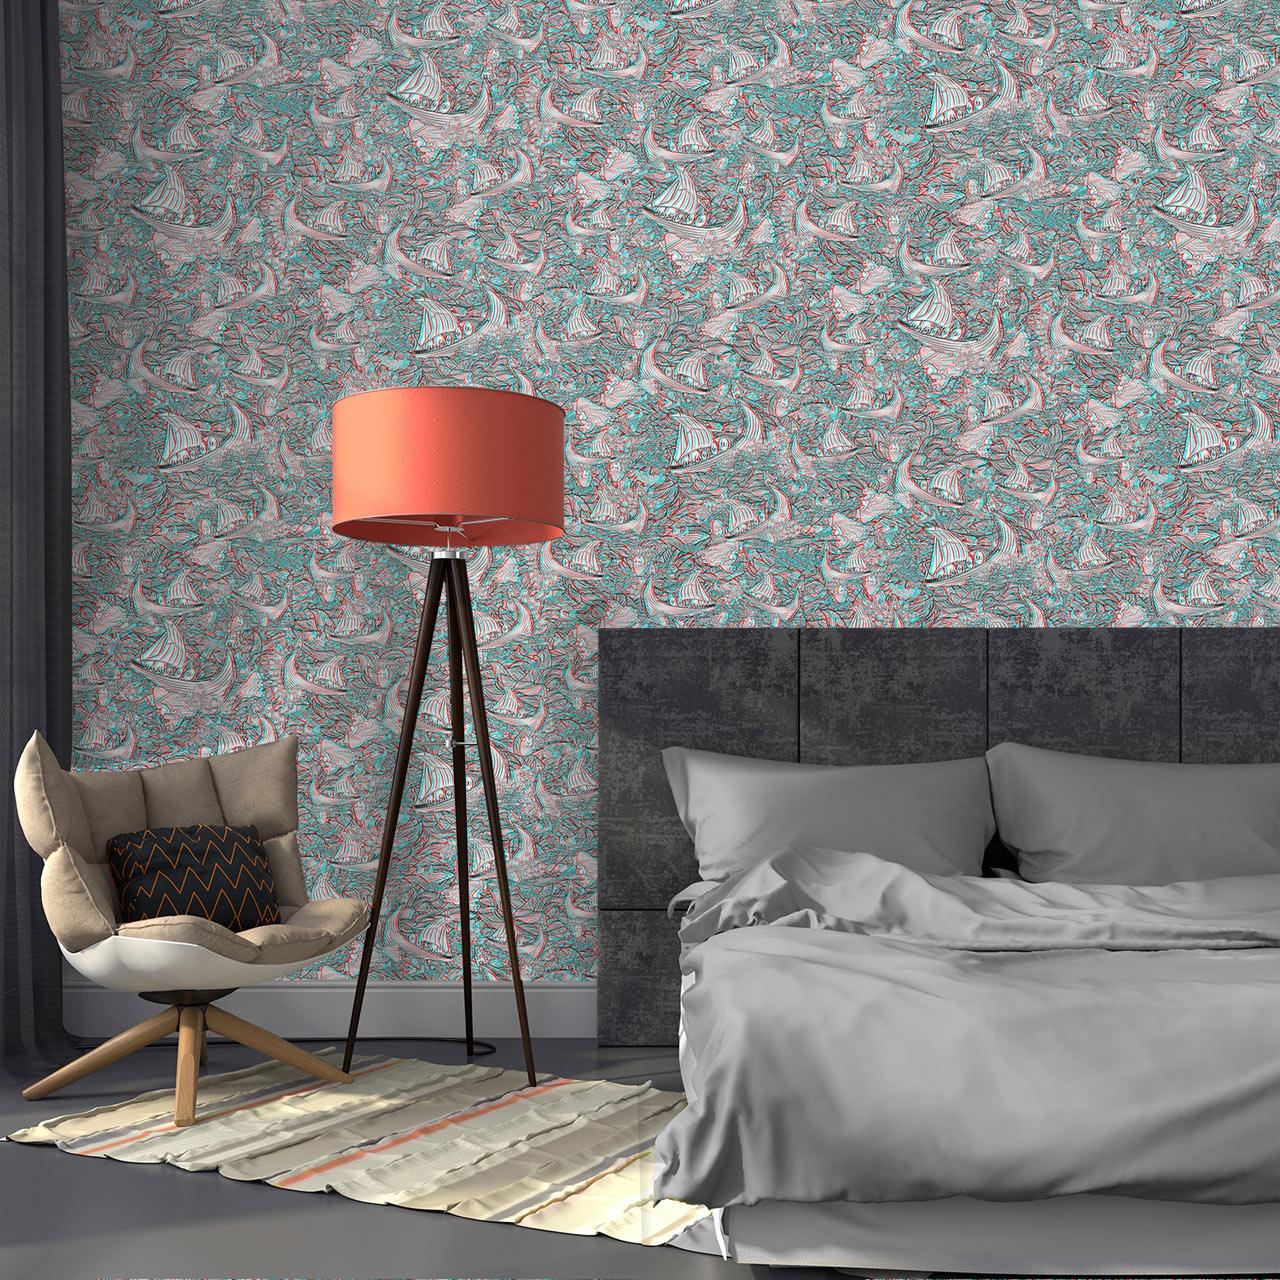 3d wallpaper design - How Twenty2 S Vikingr 3d Wallpaper Was Designed